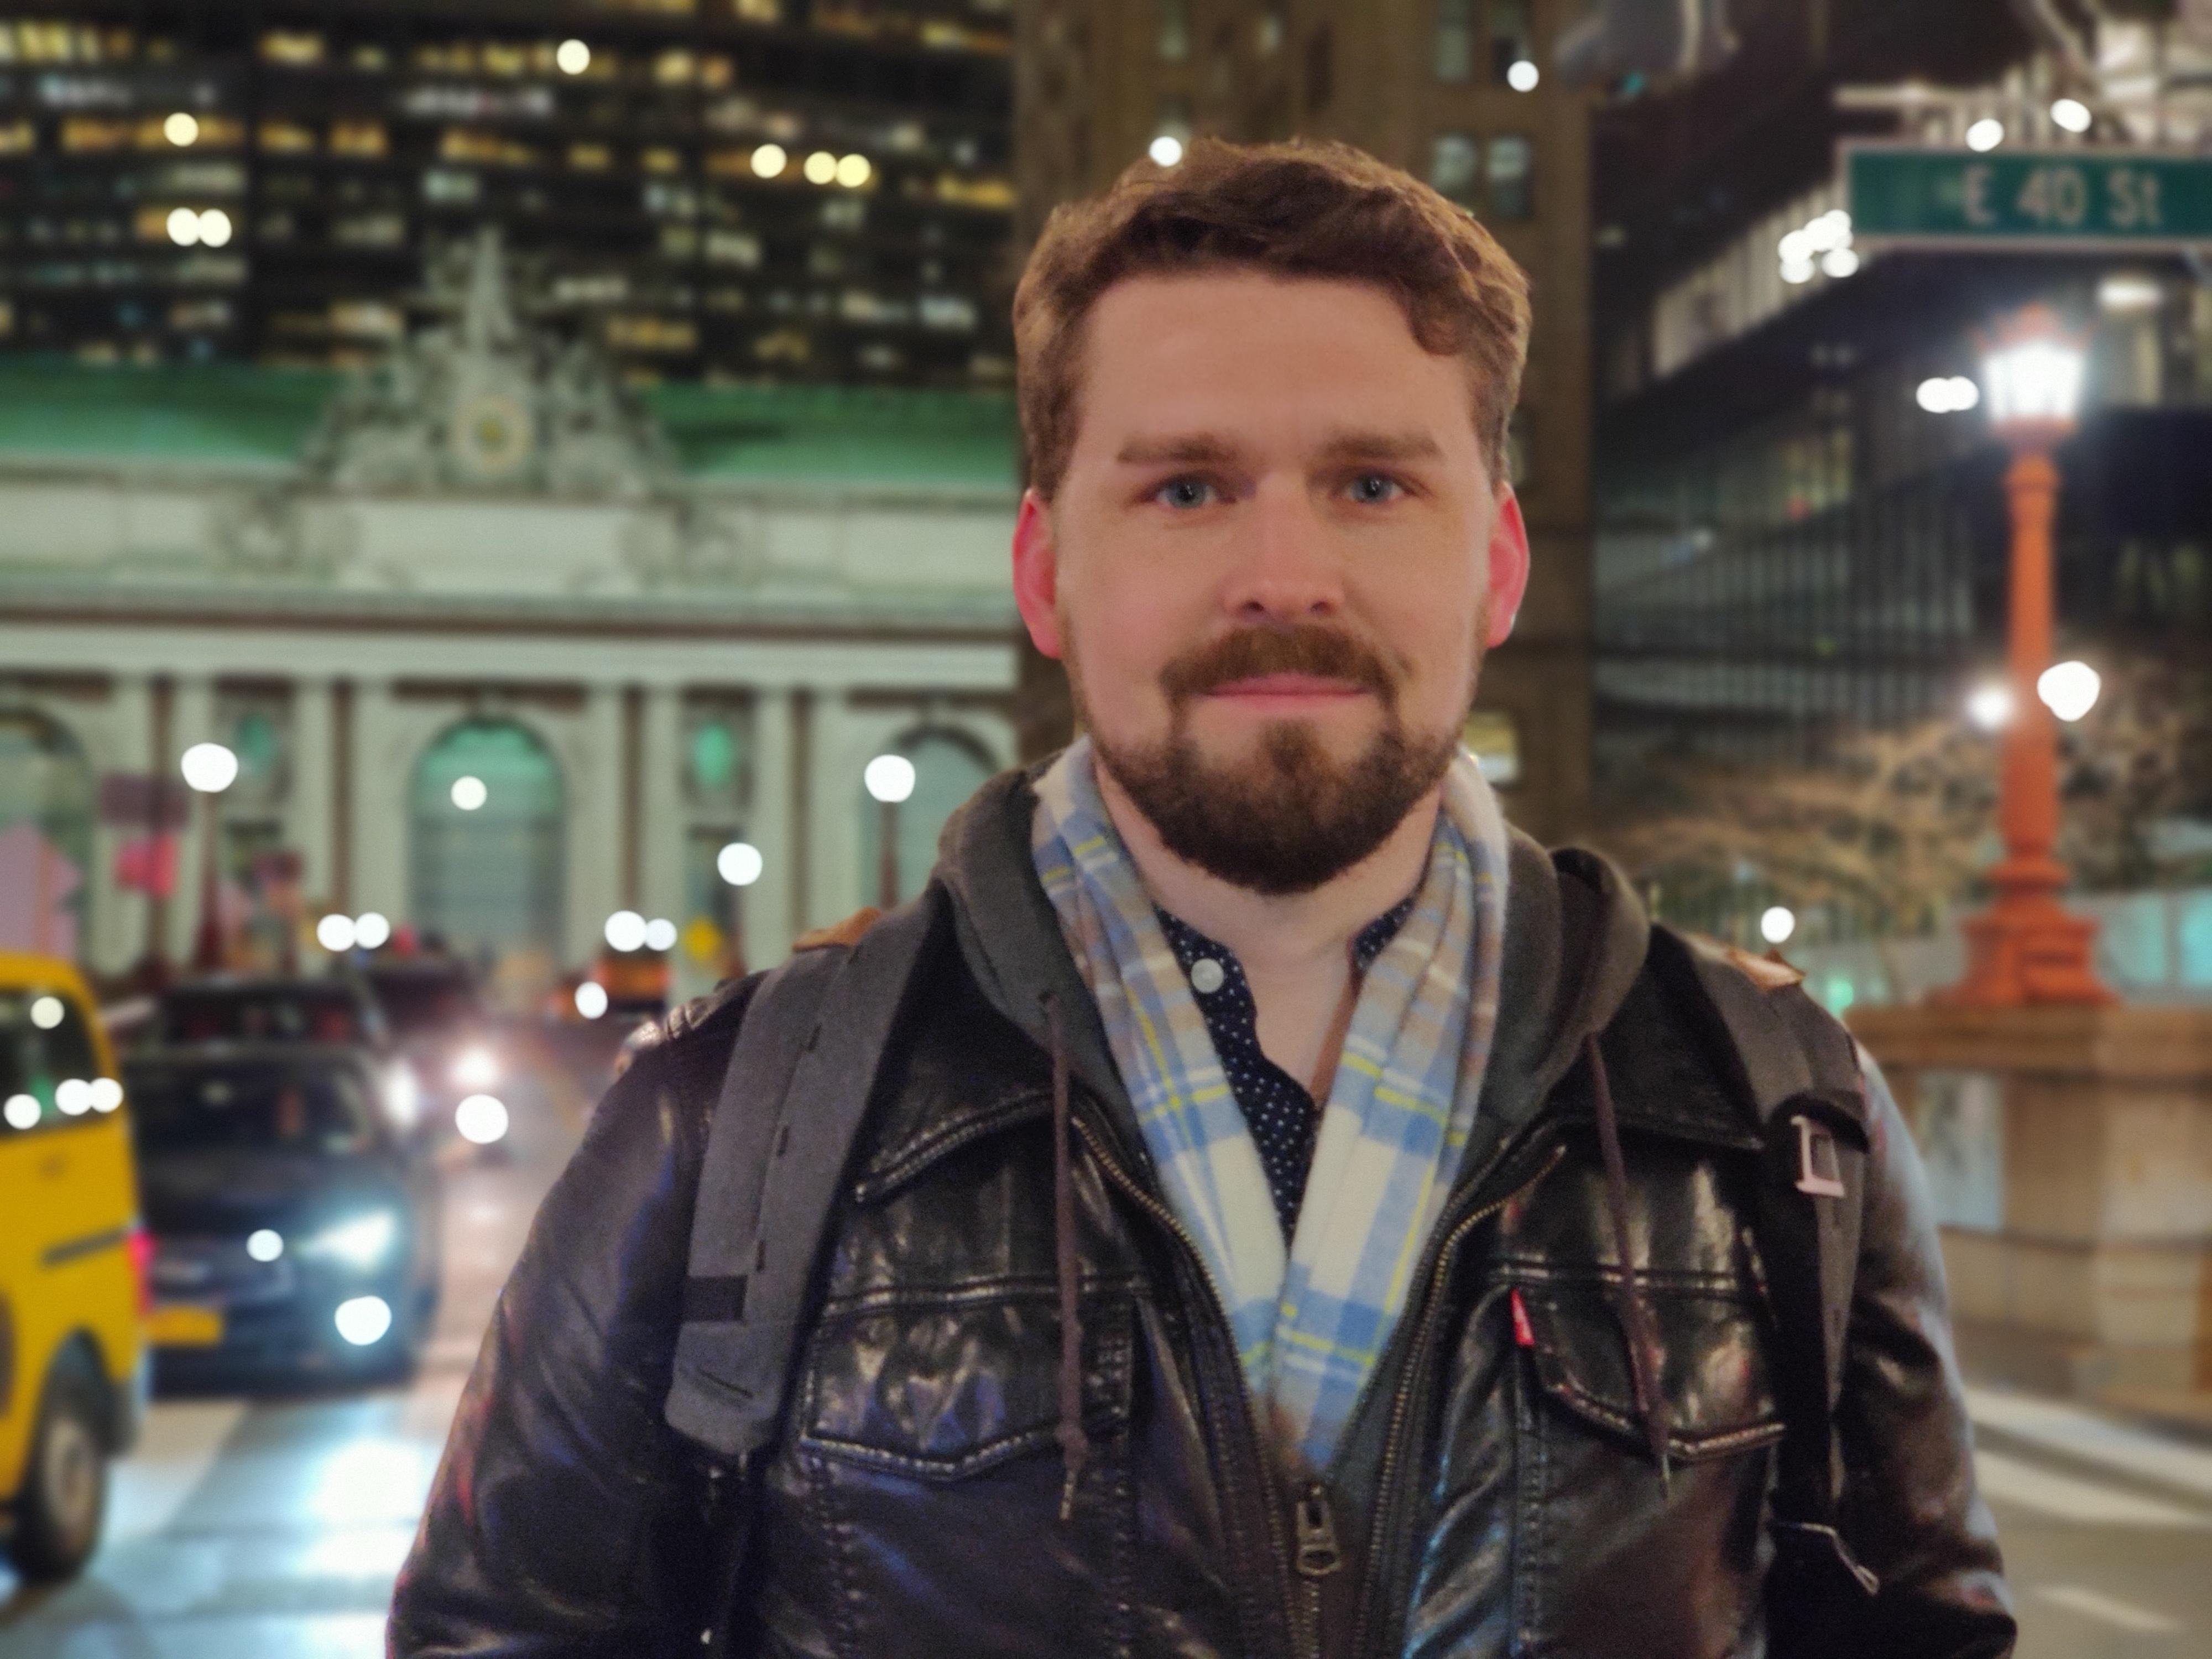 OnePlus 7 Pro camera sample